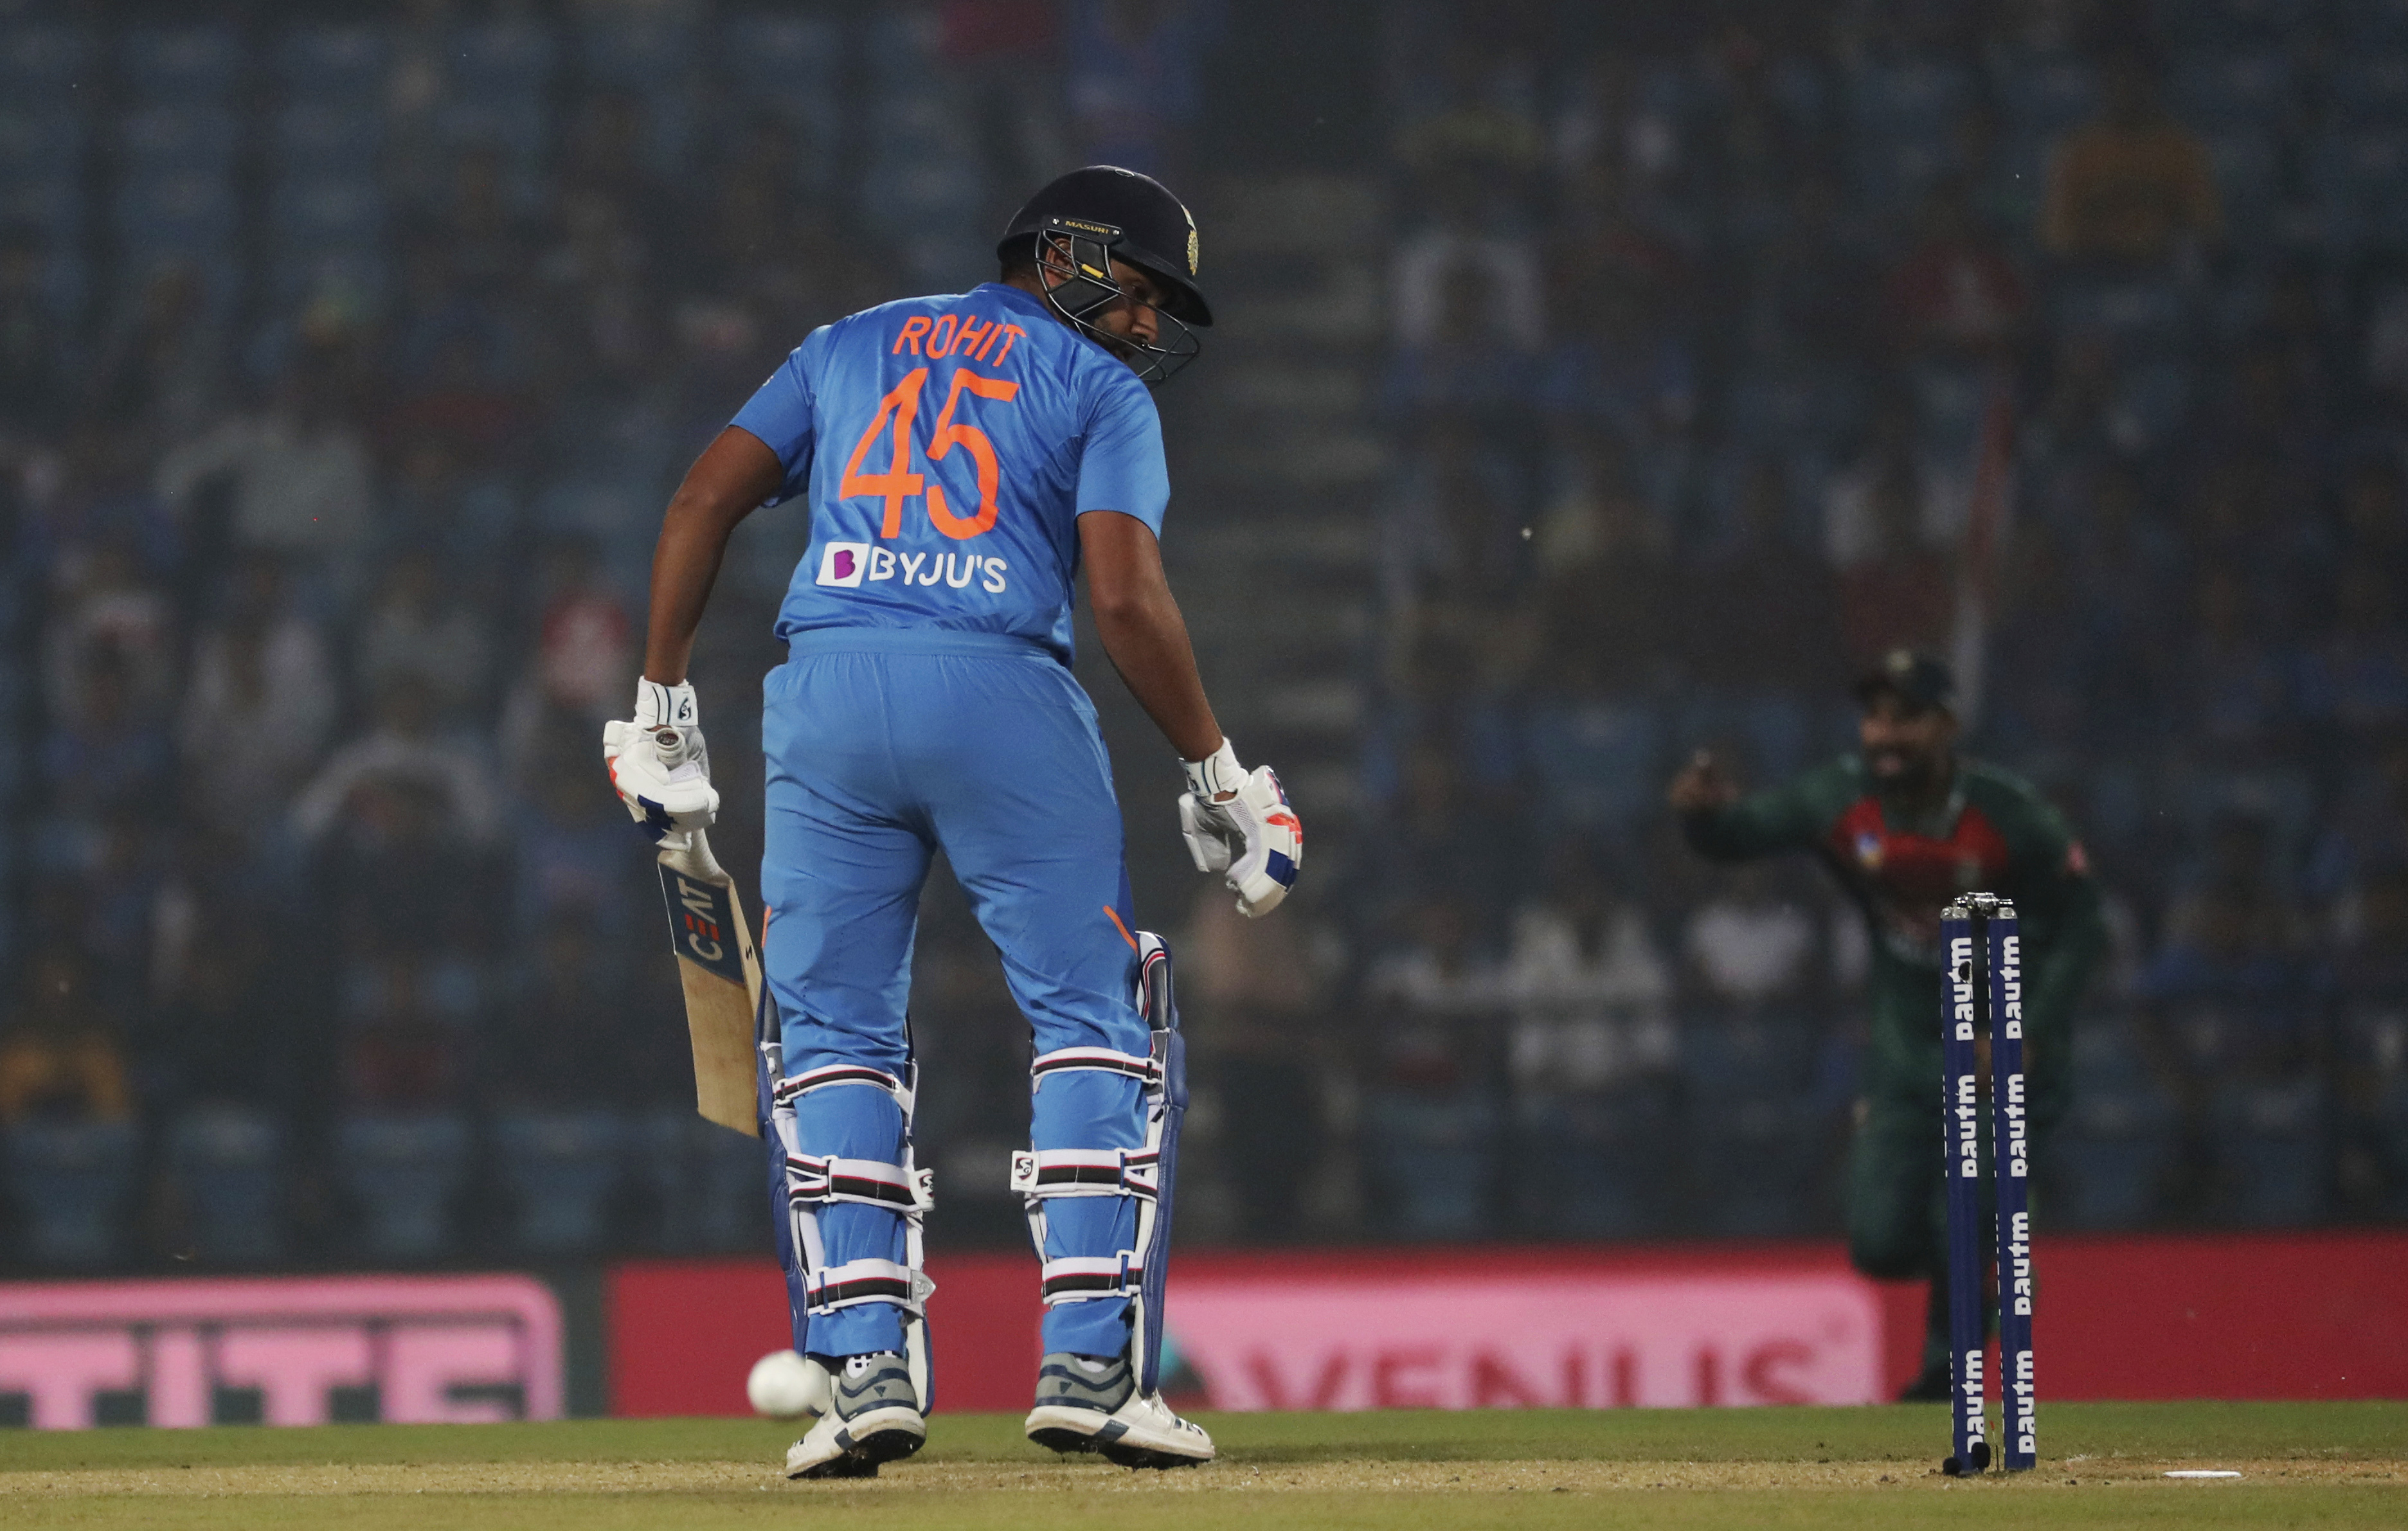 India's Rohit Sharma is bowled during third Twenty20 international cricket match against Bangladesh in Nagpur, India, Sunday, November 10, 2019